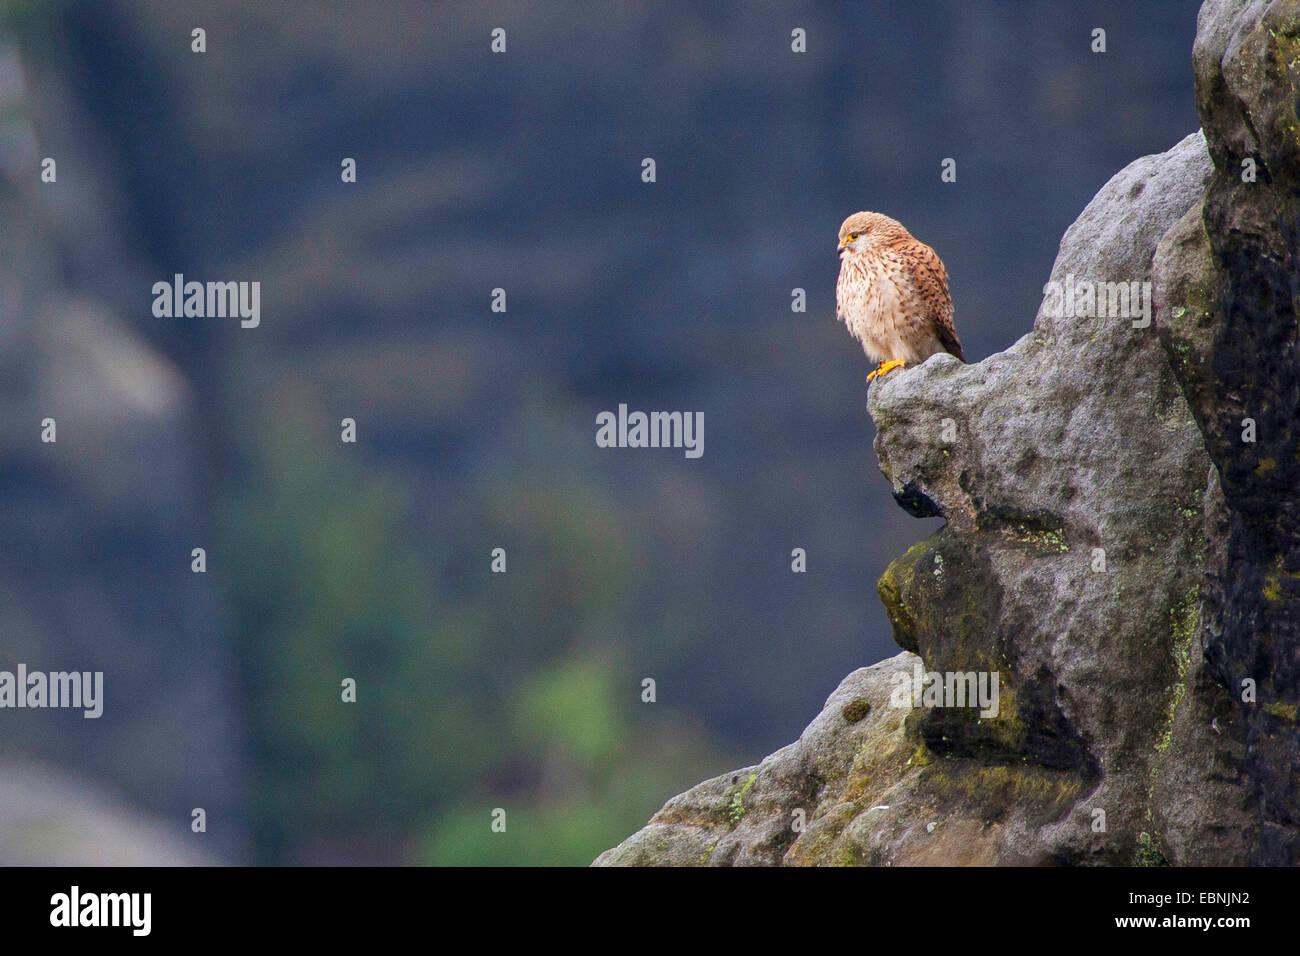 European Kestrel, Eurasian Kestrel, Old World Kestrel, Common Kestrel (Falco tinnunculus), on a rock in its habitat, - Stock Image